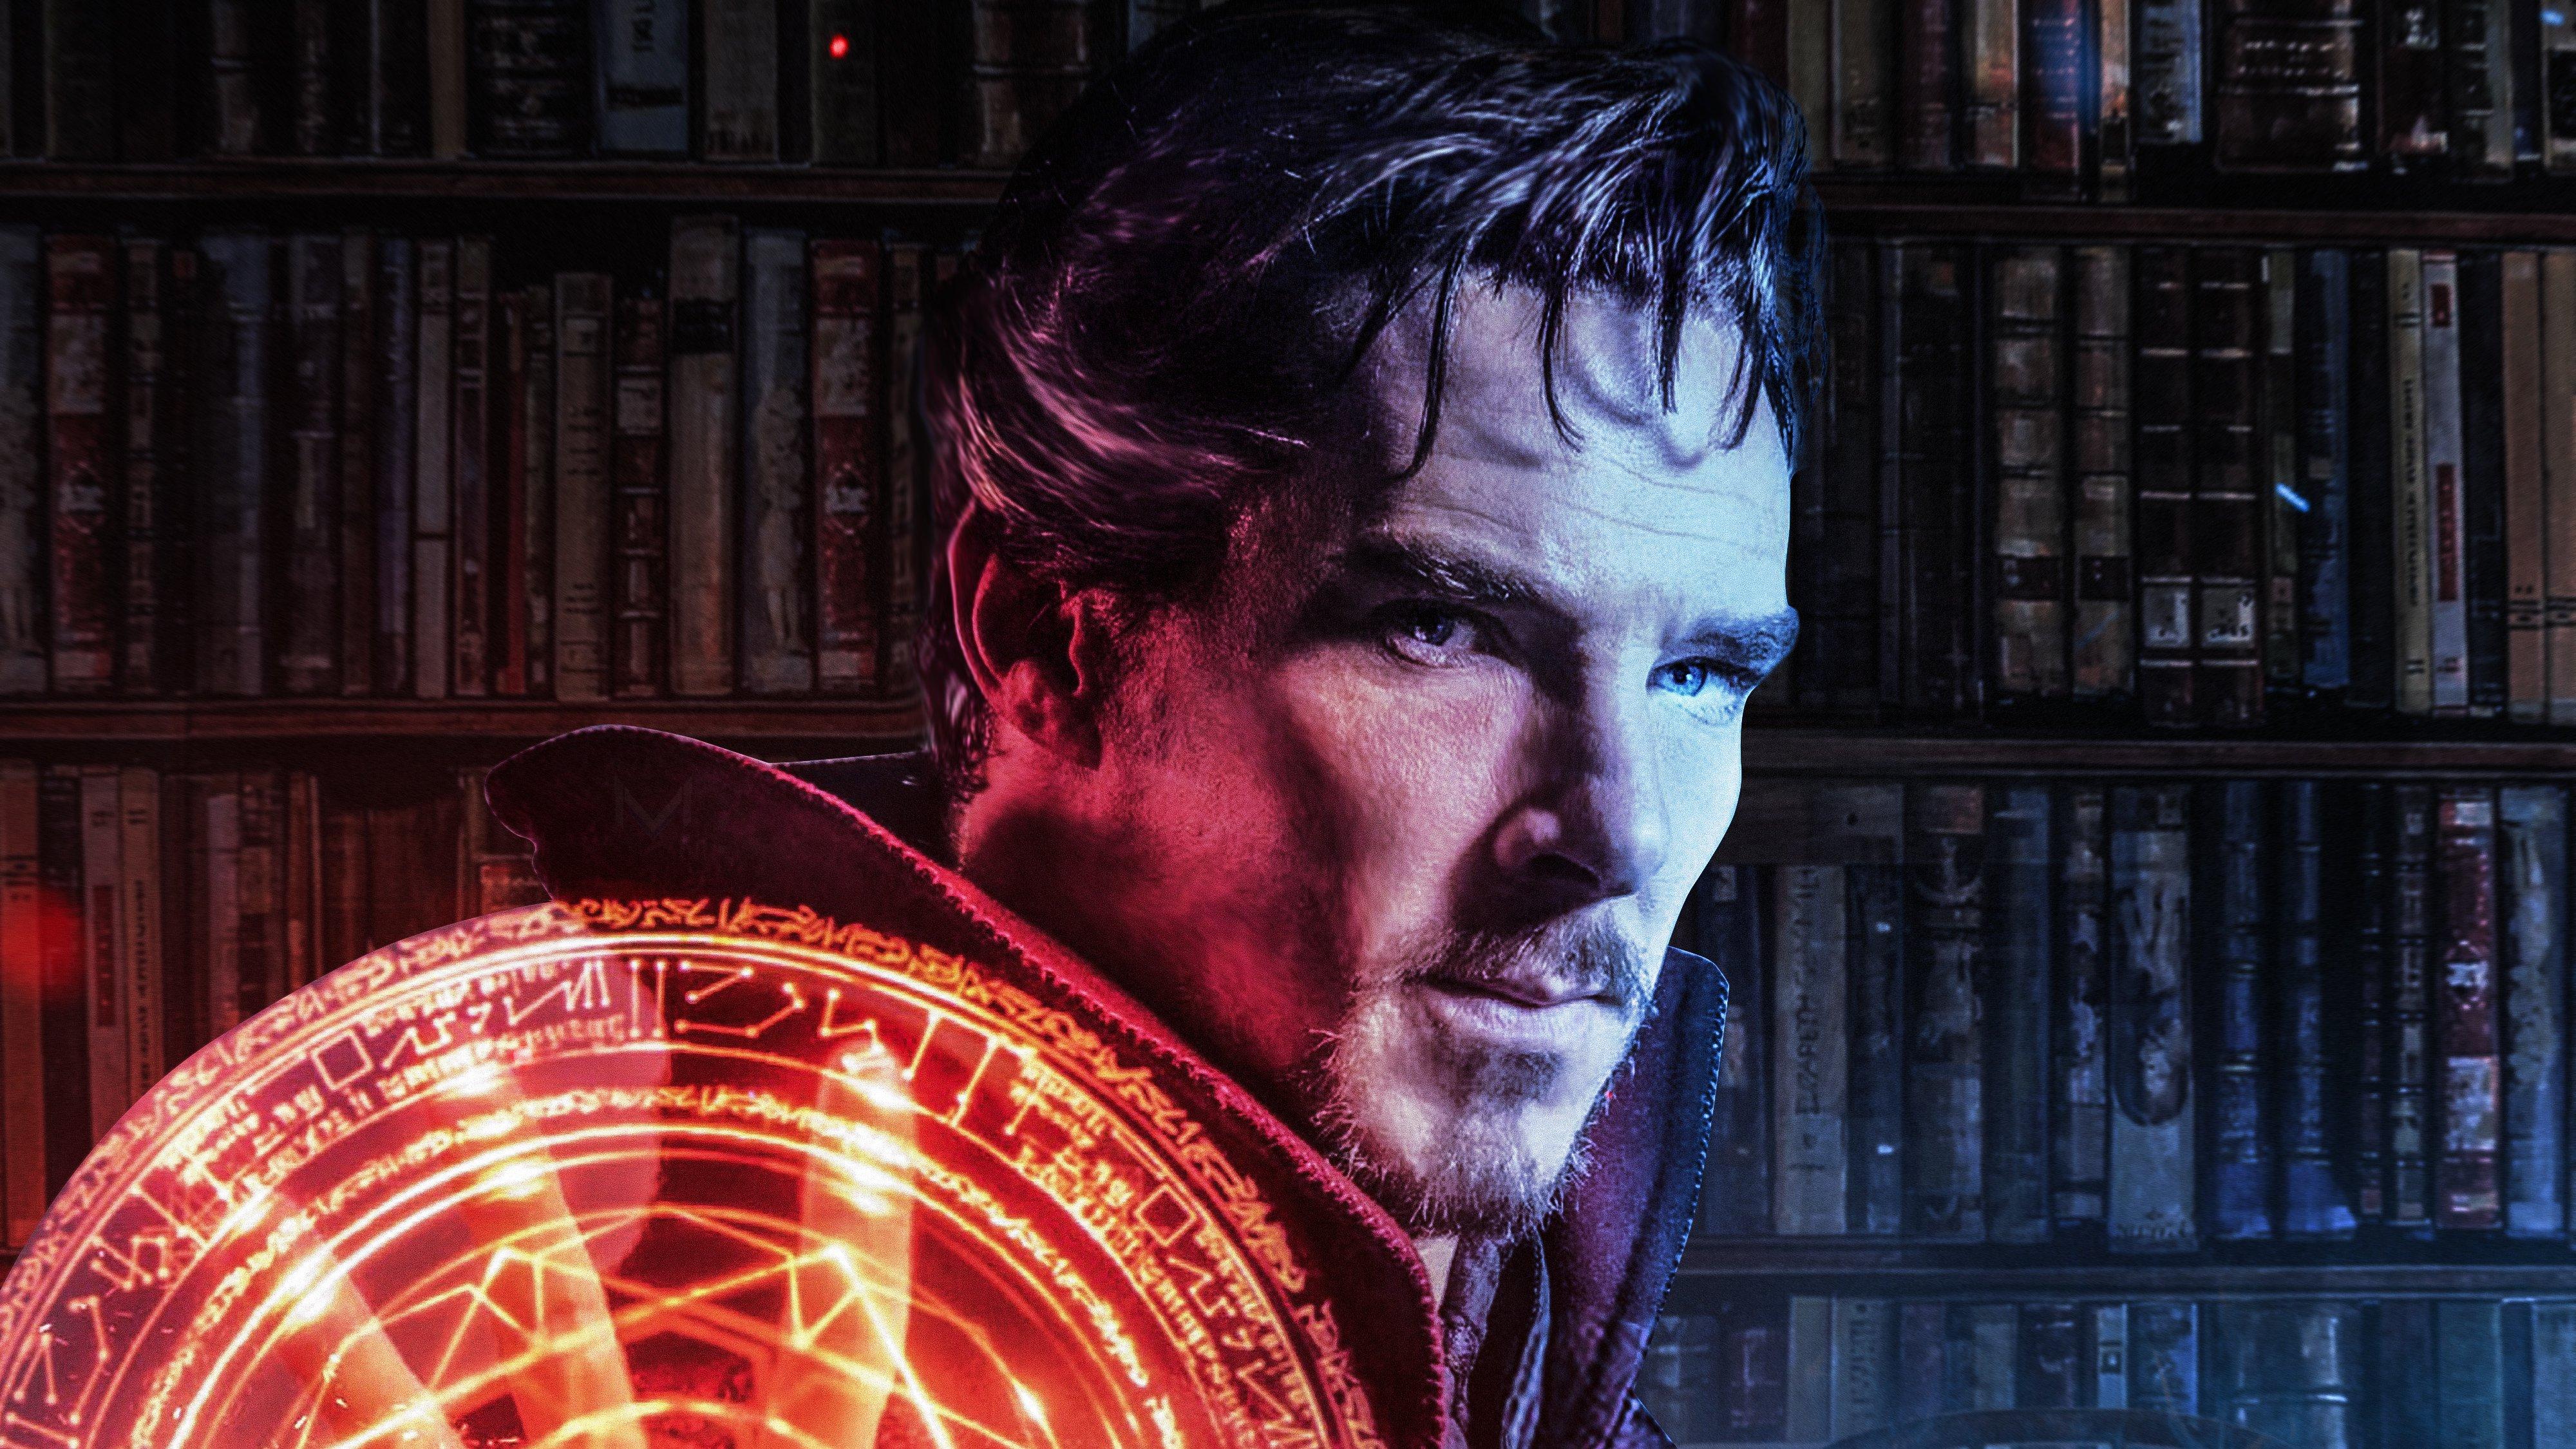 Fondos de pantalla Cyberpunk Doctor Strange Fanart